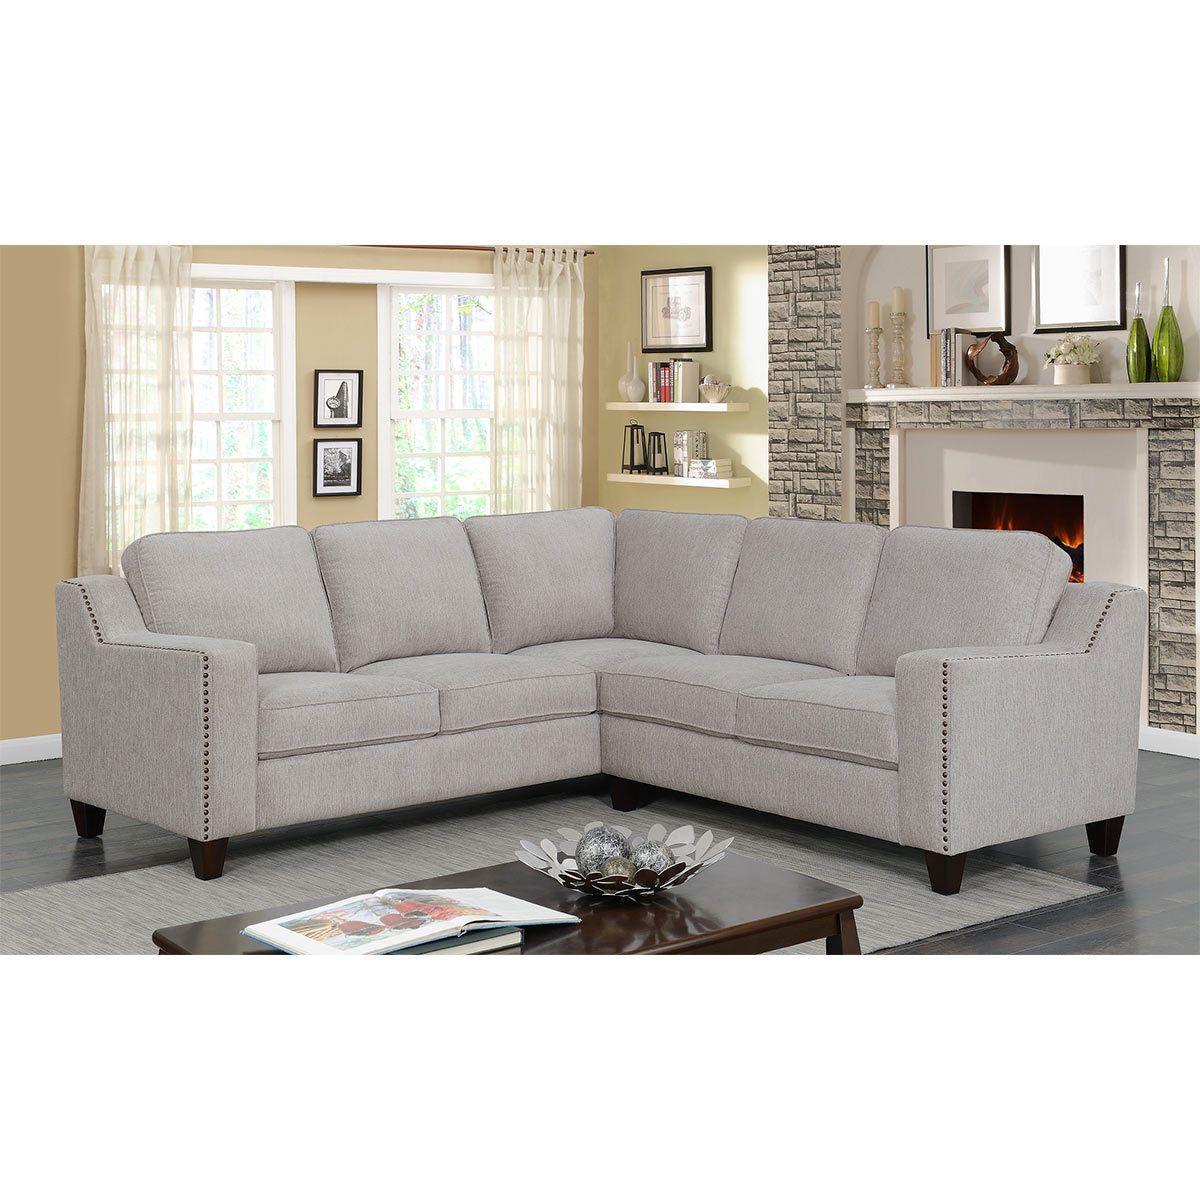 Mstar International Maddox Fabric Sectional Sofa Costco Uk